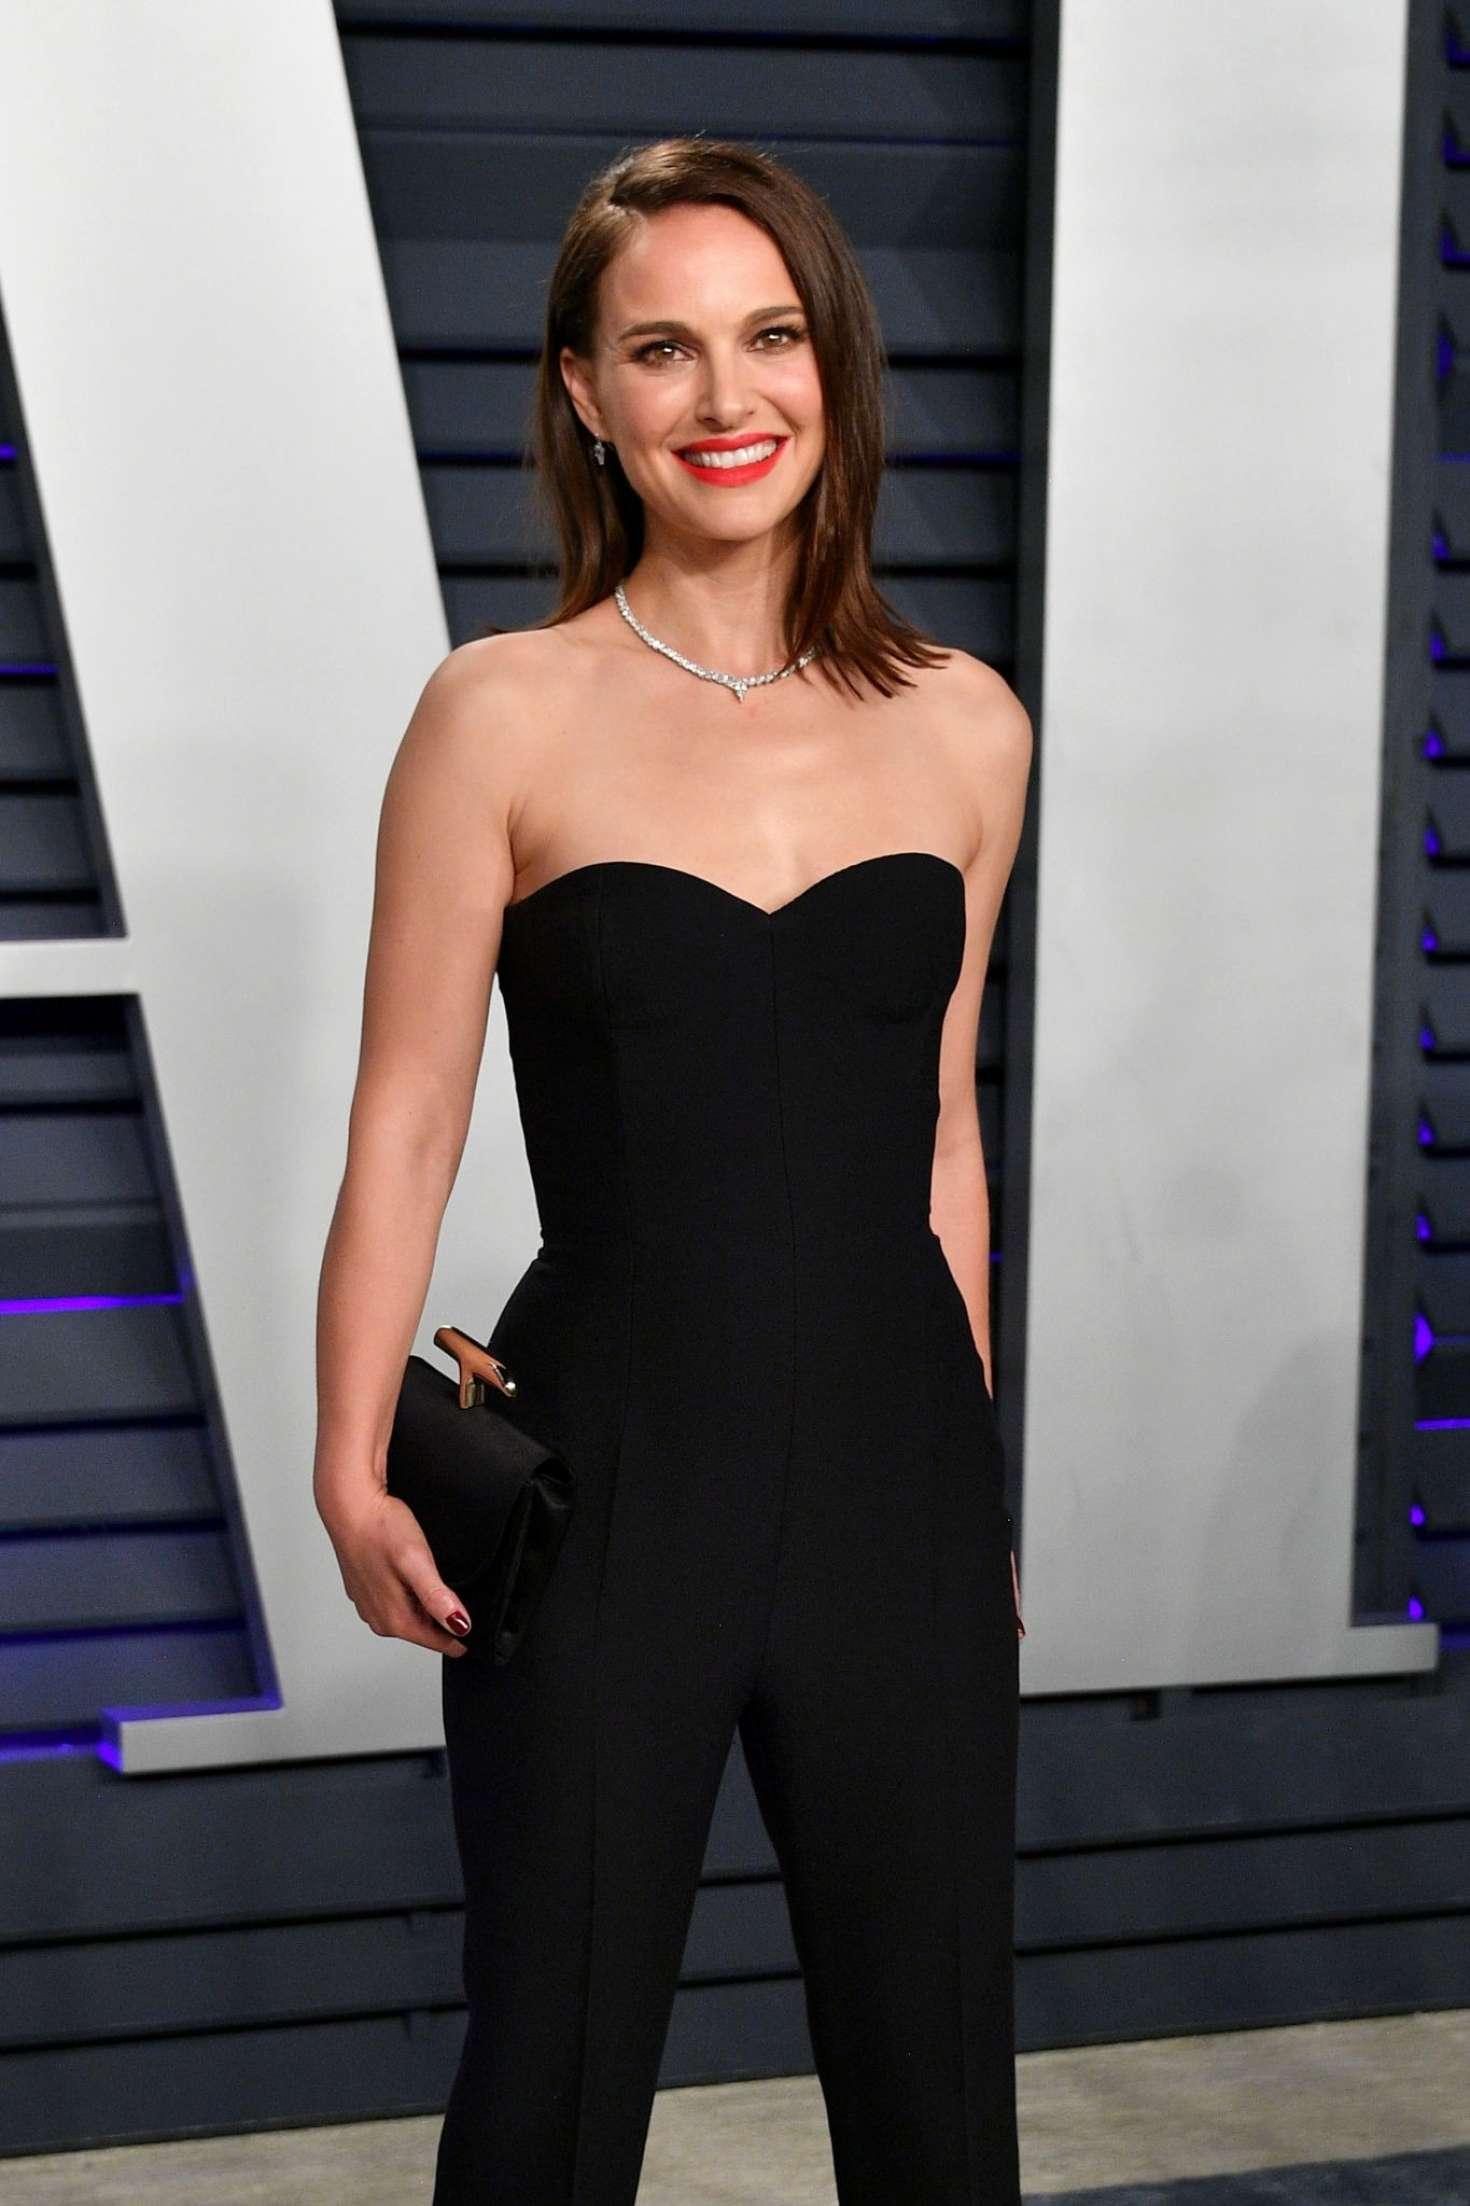 Natalie Portman - 2019 Vanity Fair Oscar Party in Beverly Hills